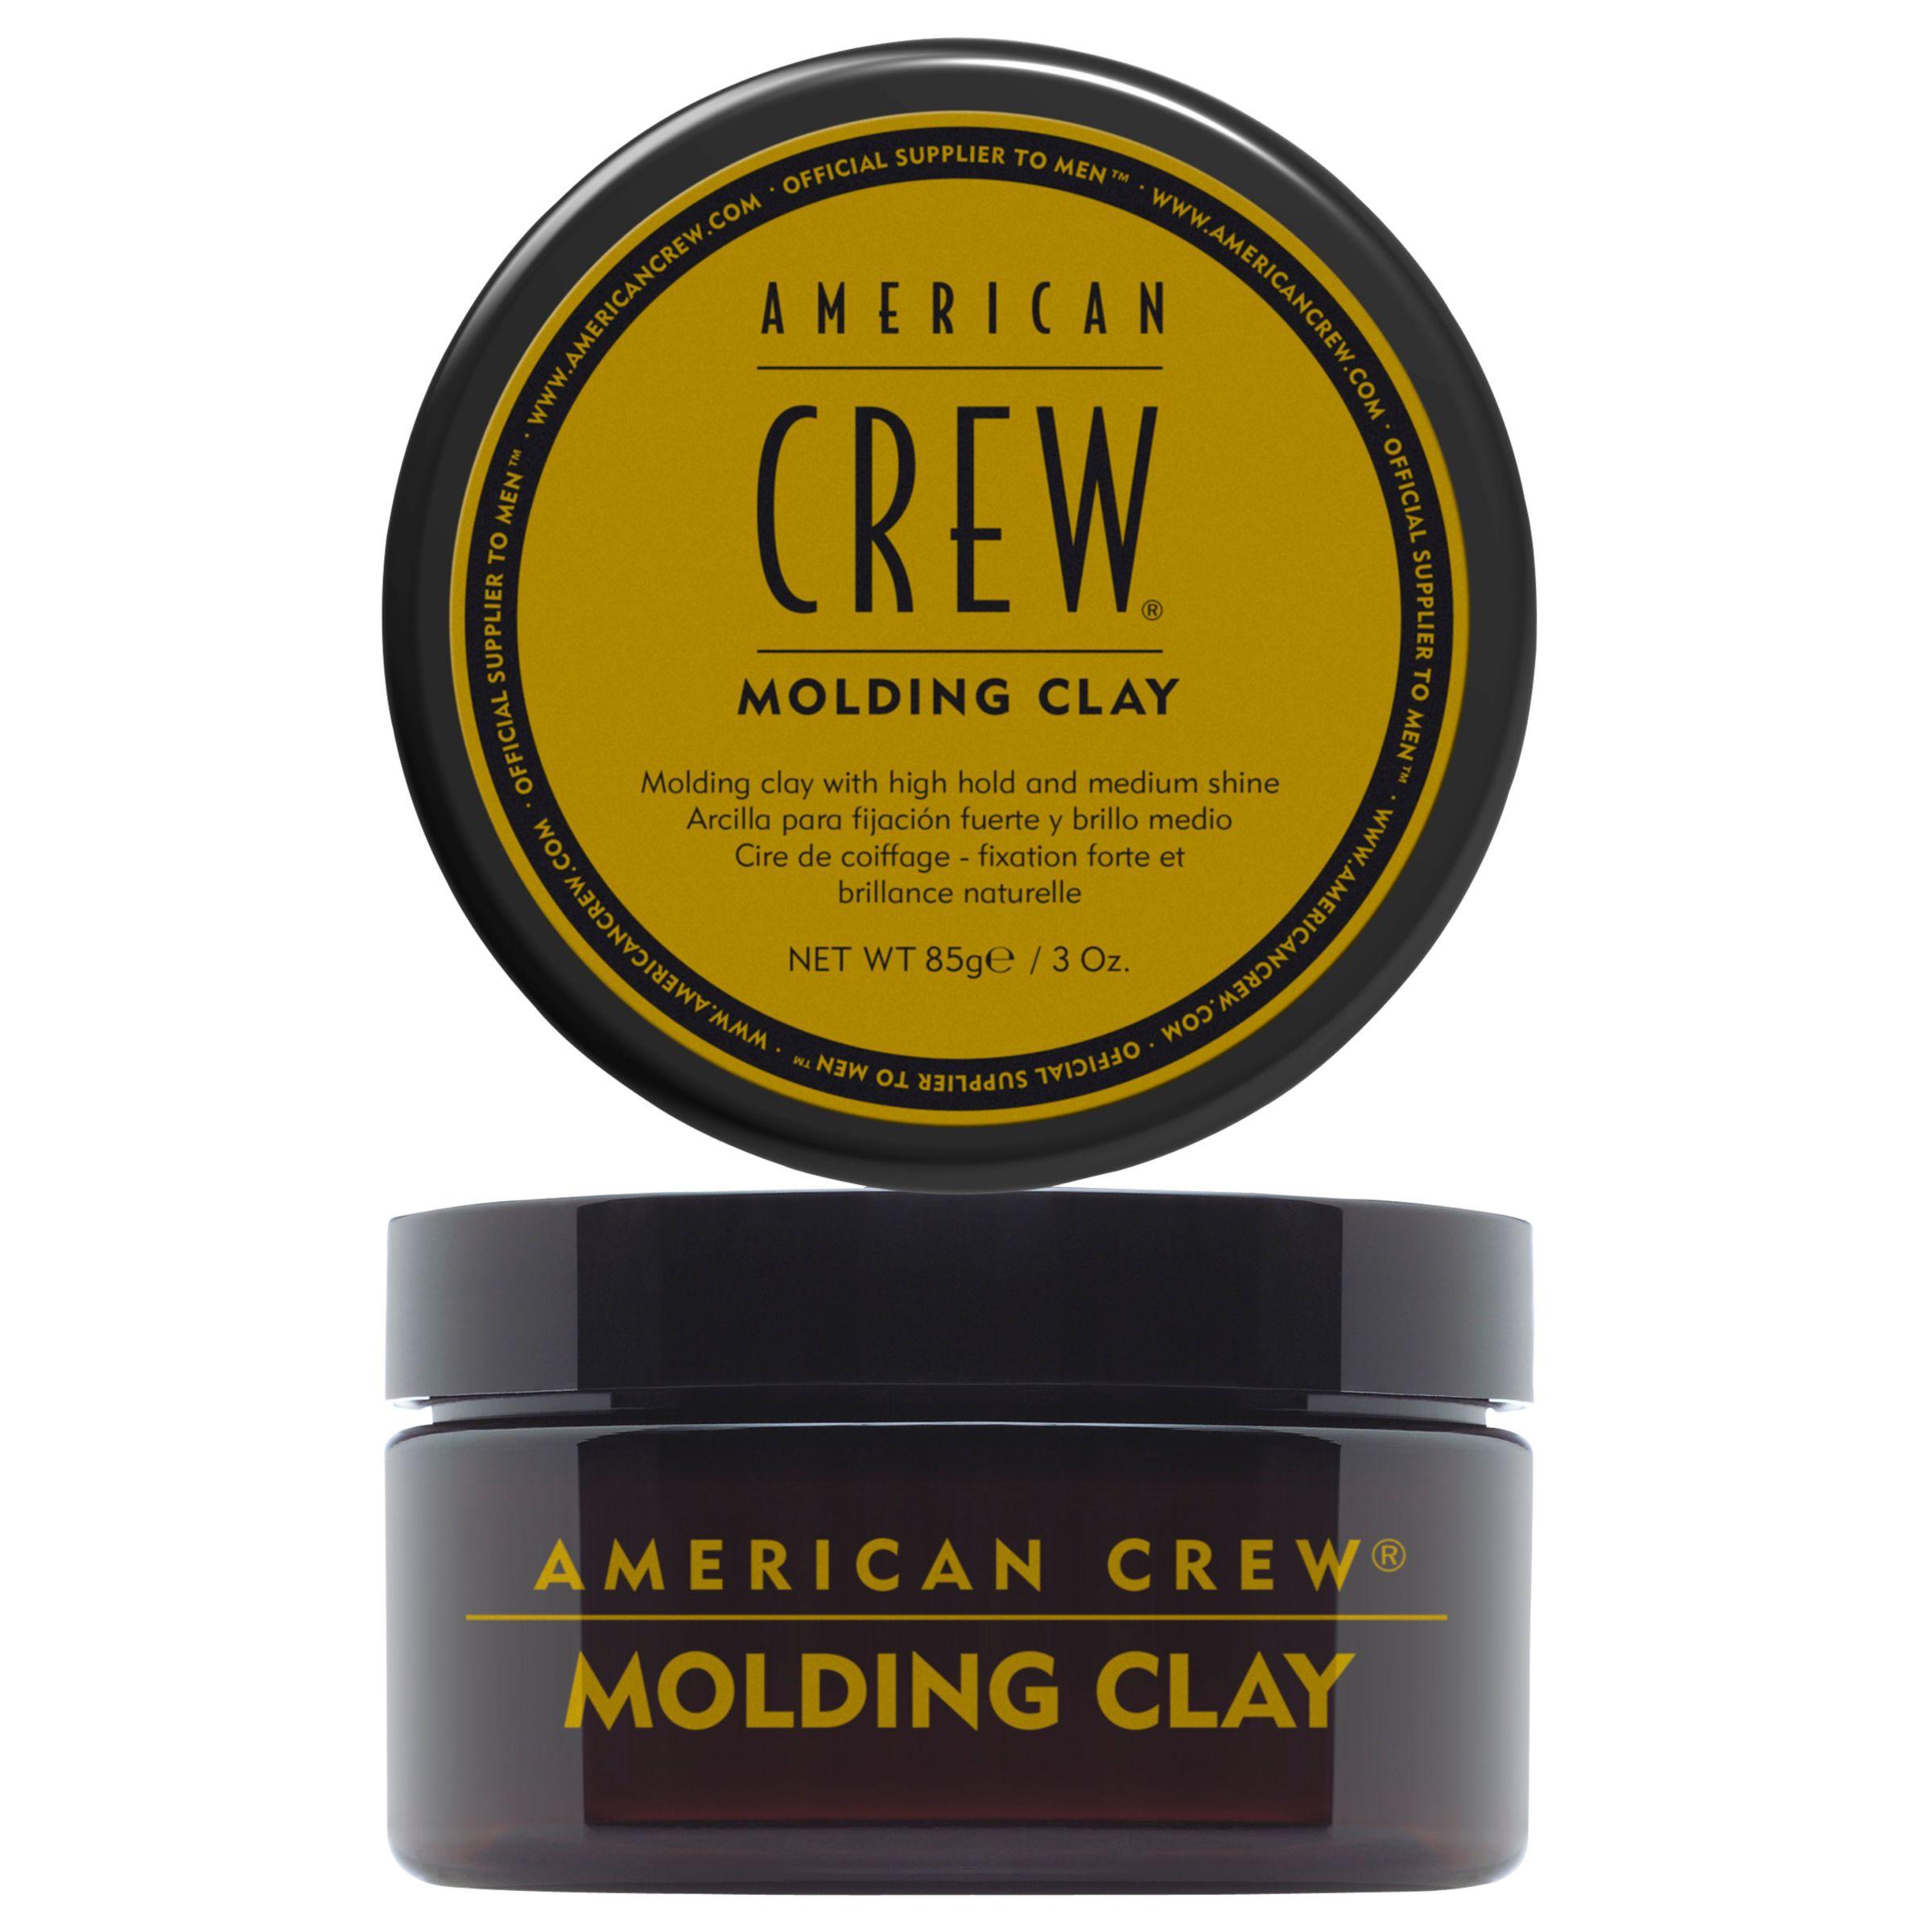 American Crew American Crew Molding Clay, 85g